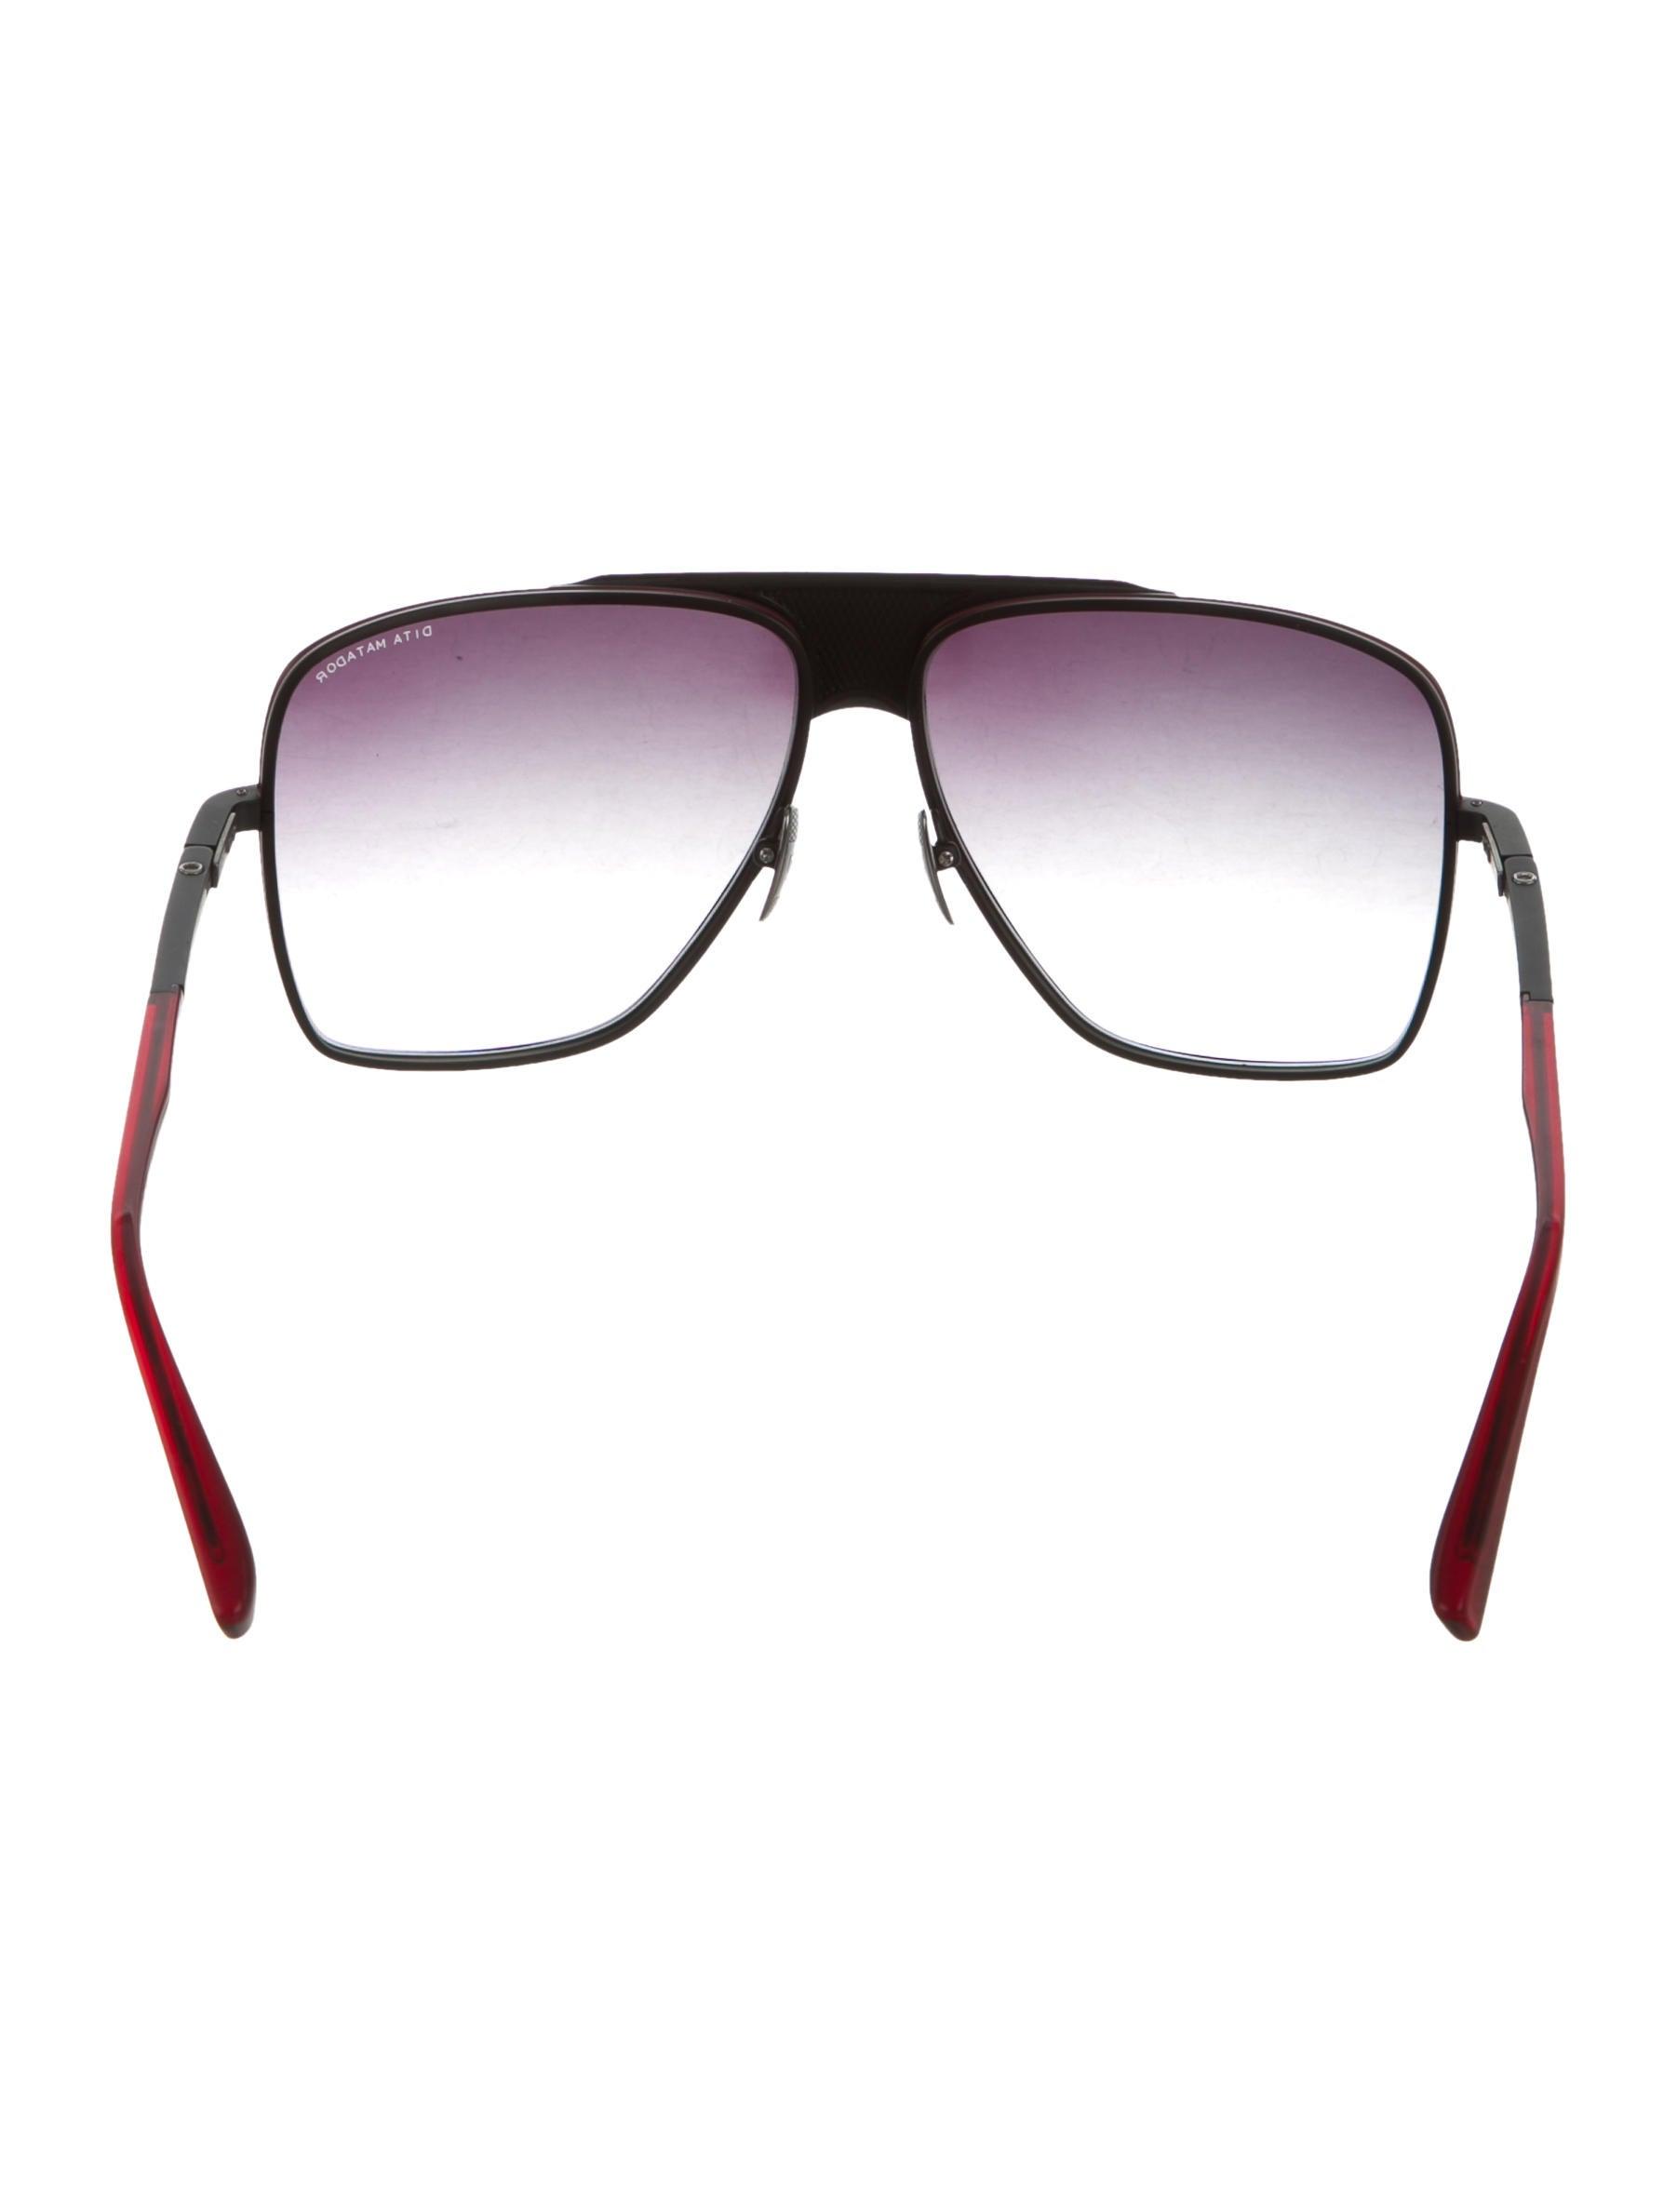 e4c47e61d43 Dita Matador Replica Sunglasses - Bitterroot Public Library